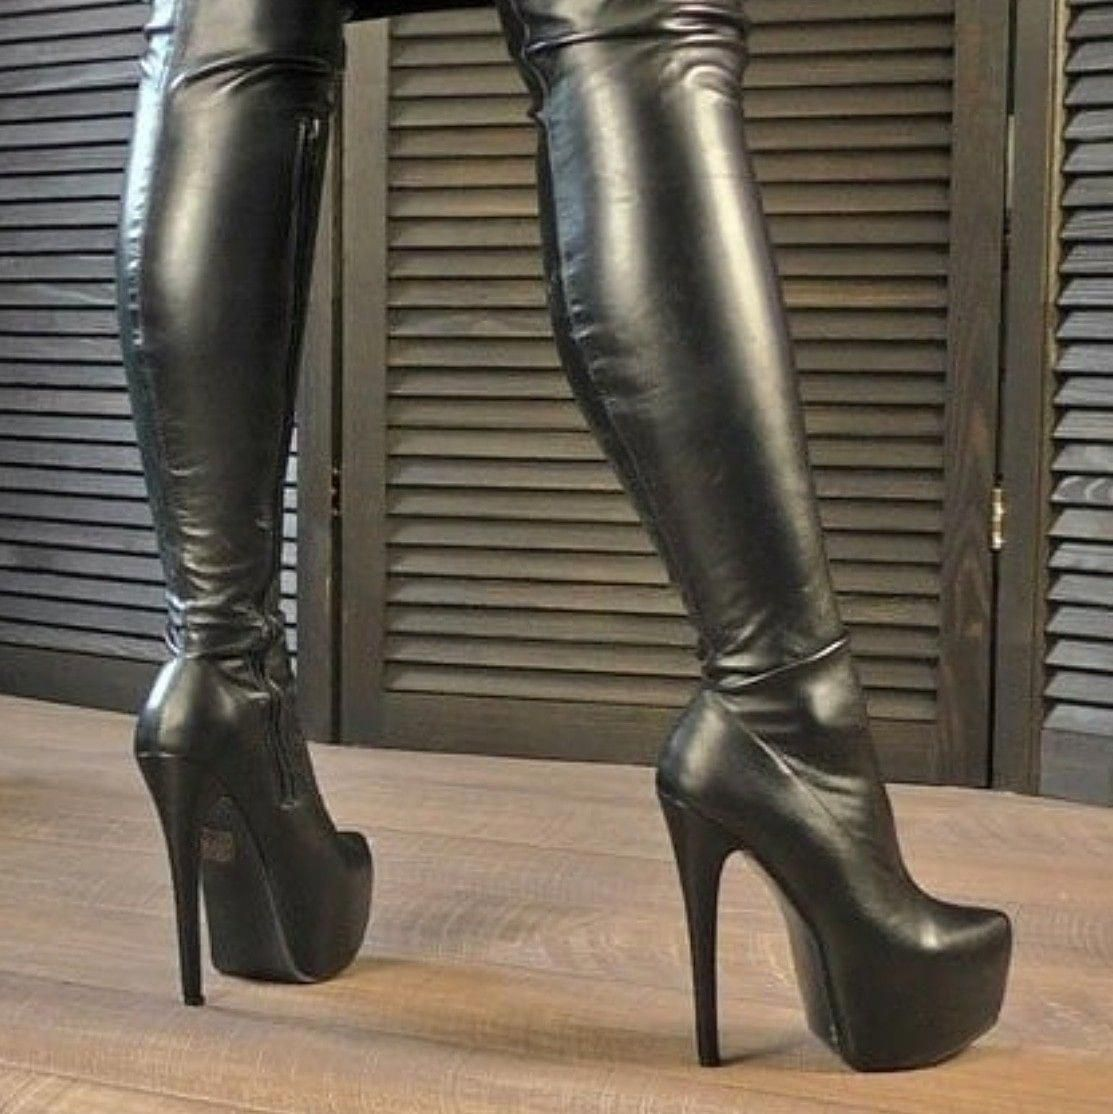 Shoeshighheels | Boots, High heel boots, Thigh high boots heels